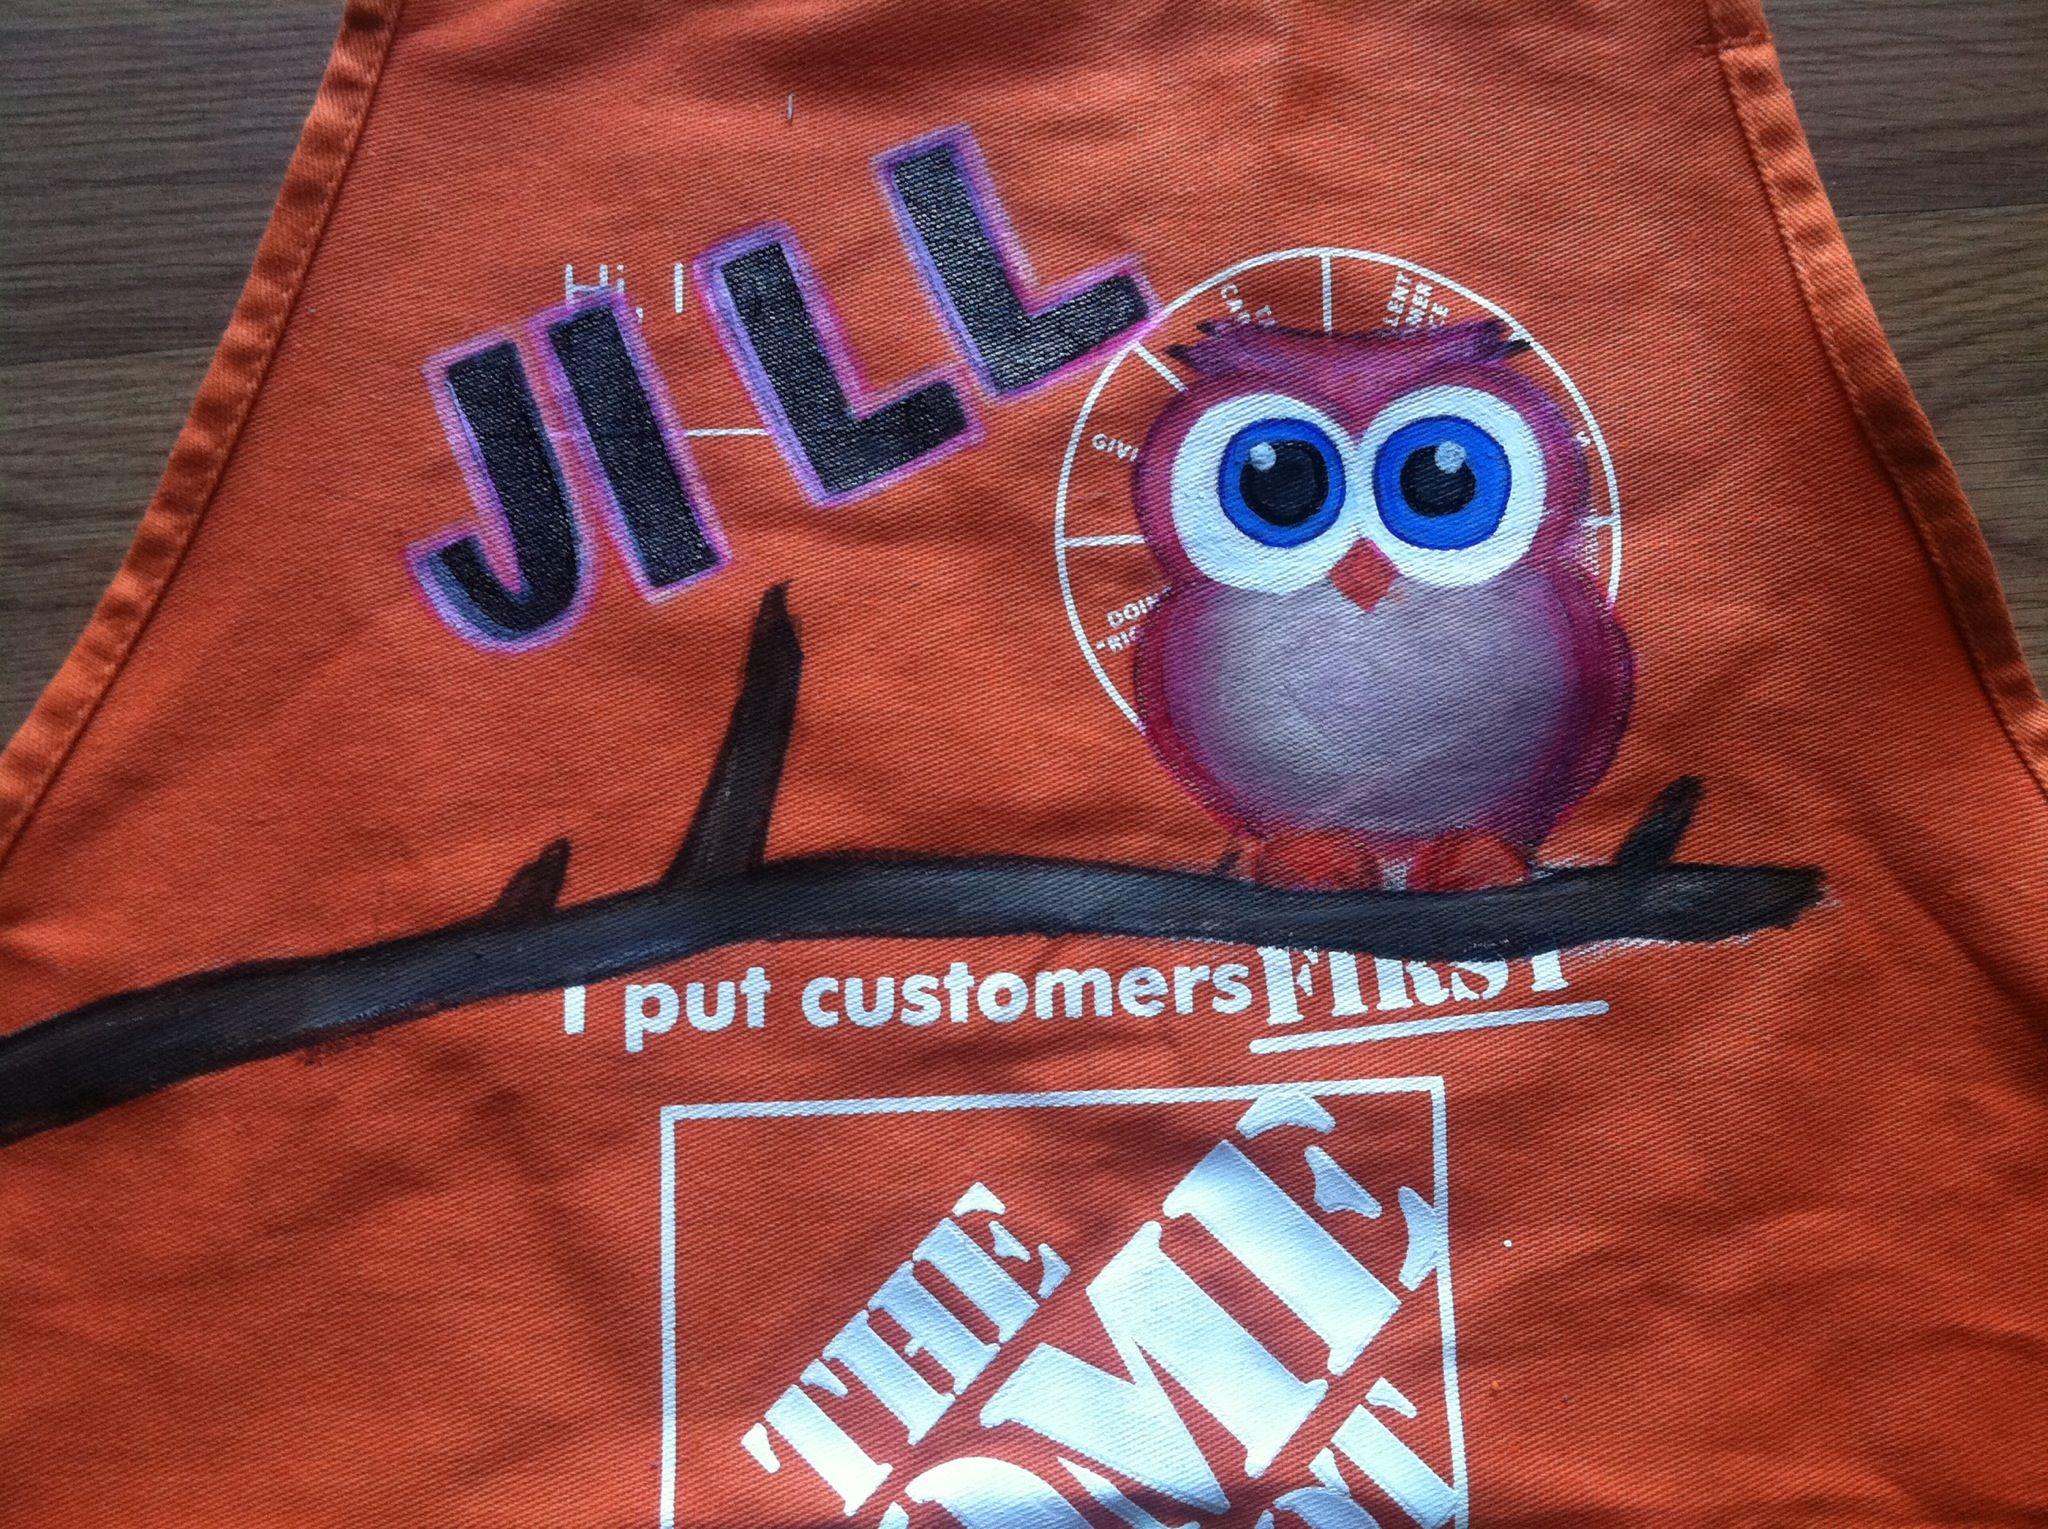 Home Depot apron   Art   Pinterest   Apron and Apron designs